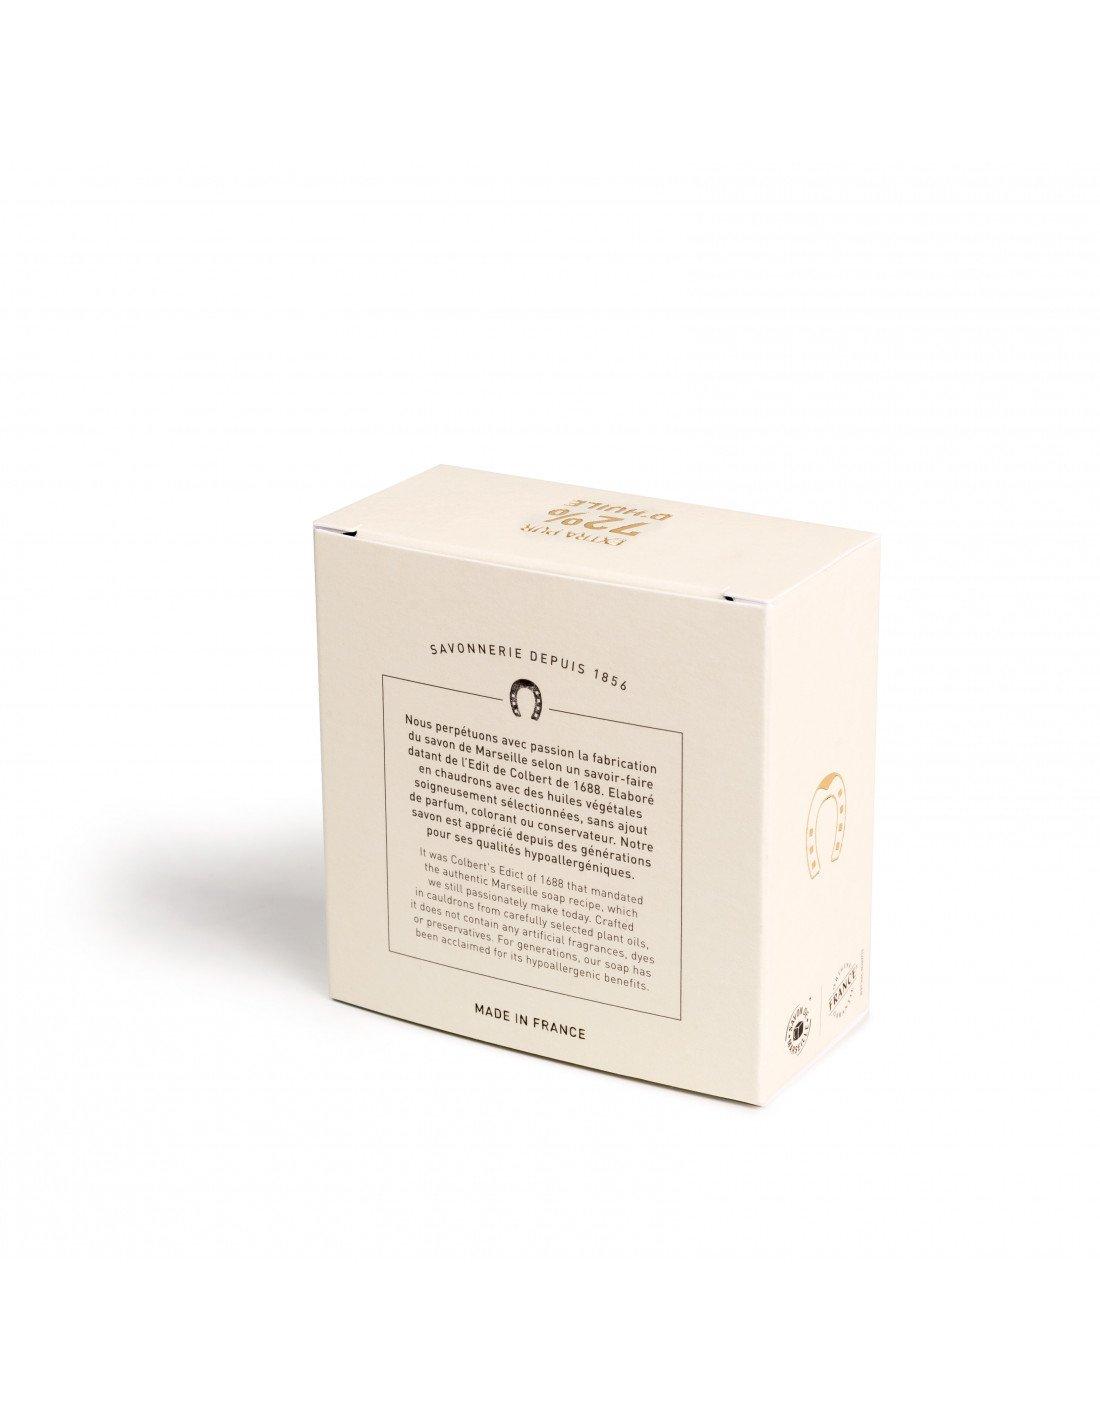 Cadeau savon de marseille 72 huile olive 150g - Composition savon de marseille ...